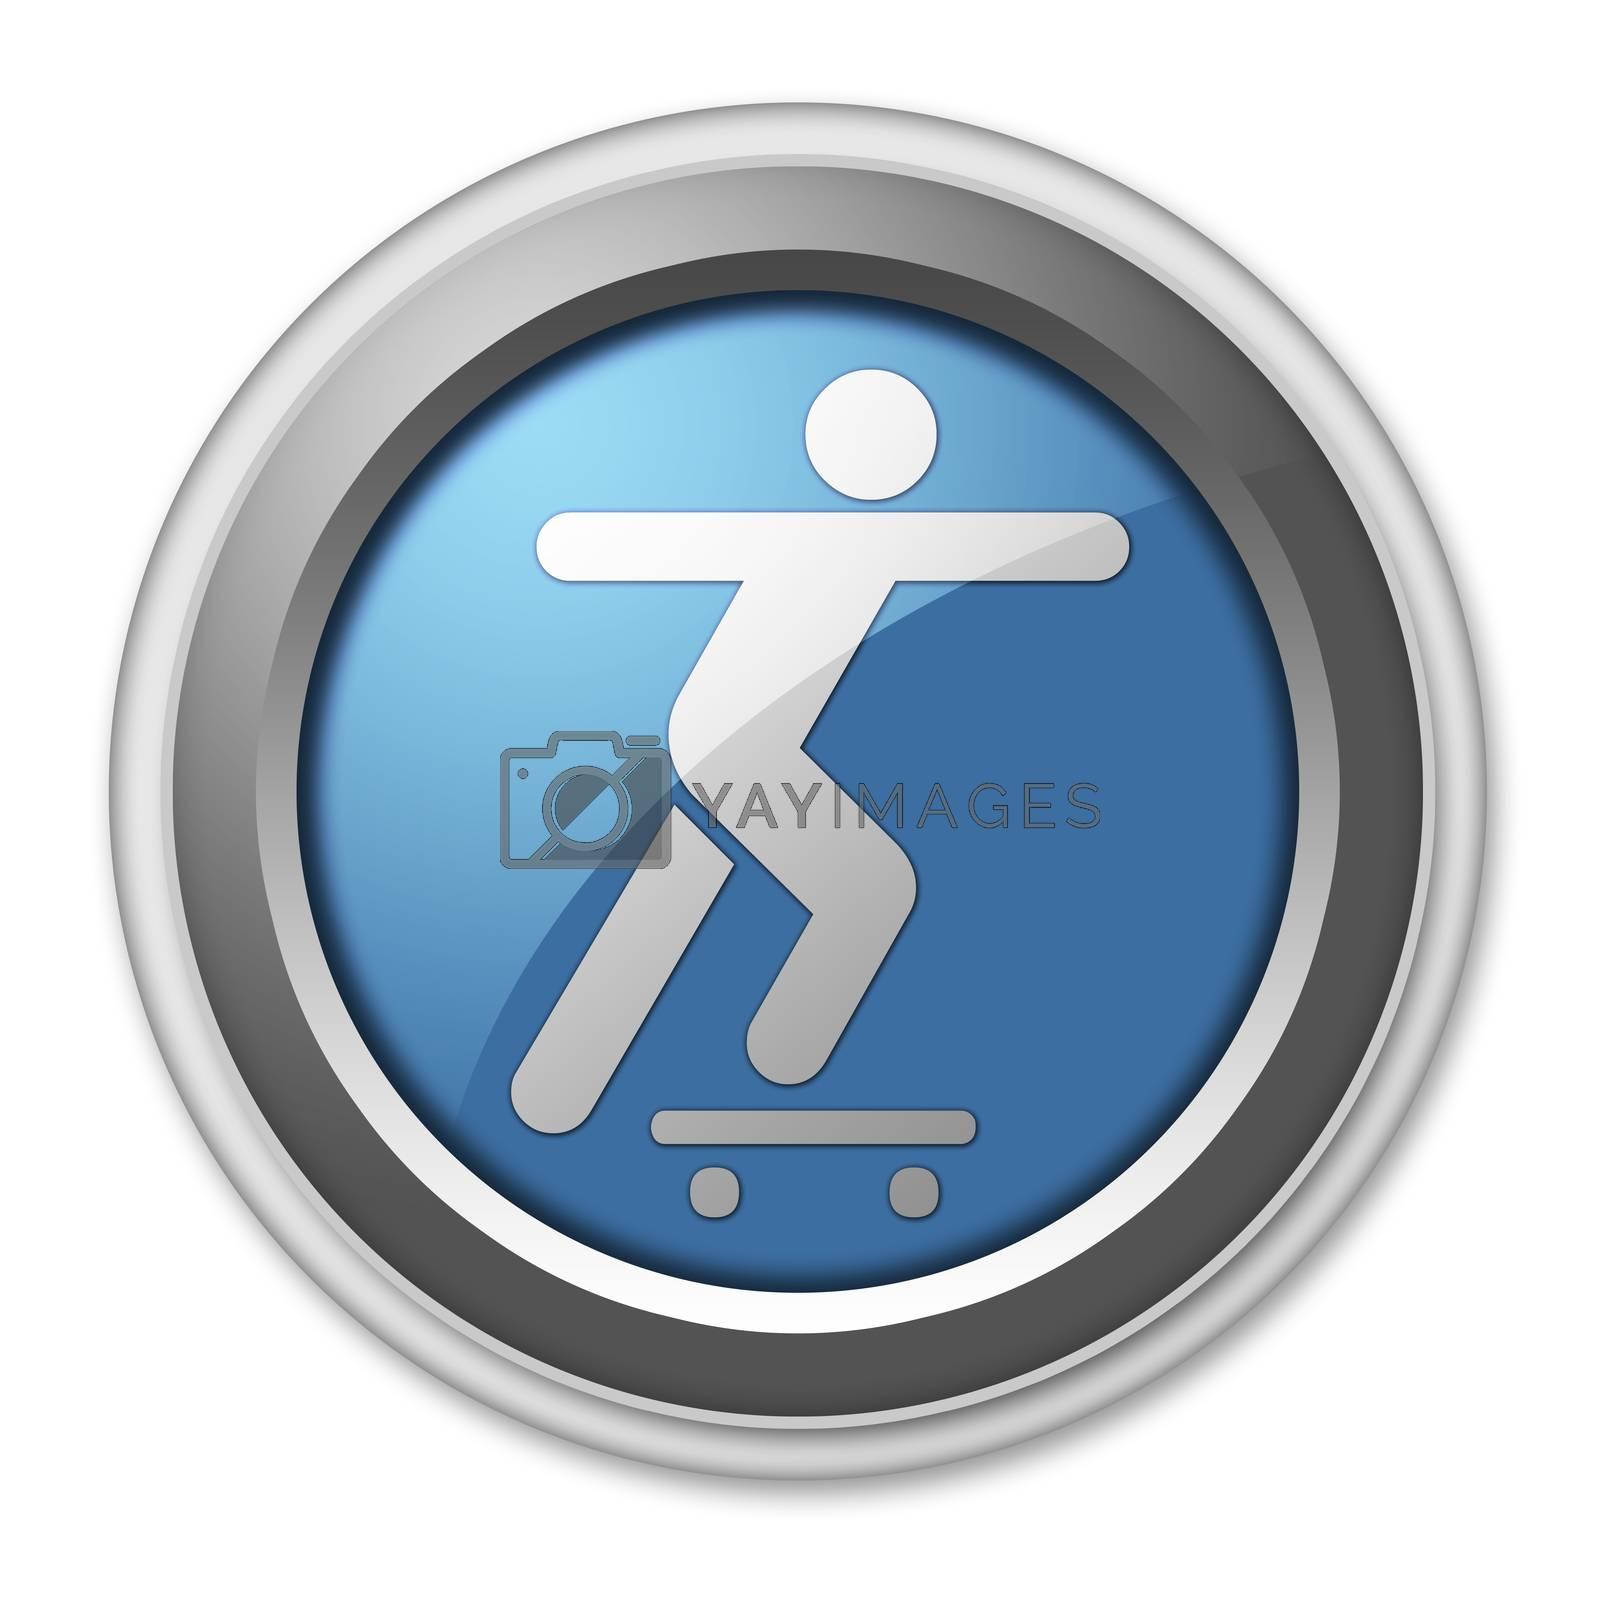 Icon, Button, Pictogram Skateboarding by mindscanner